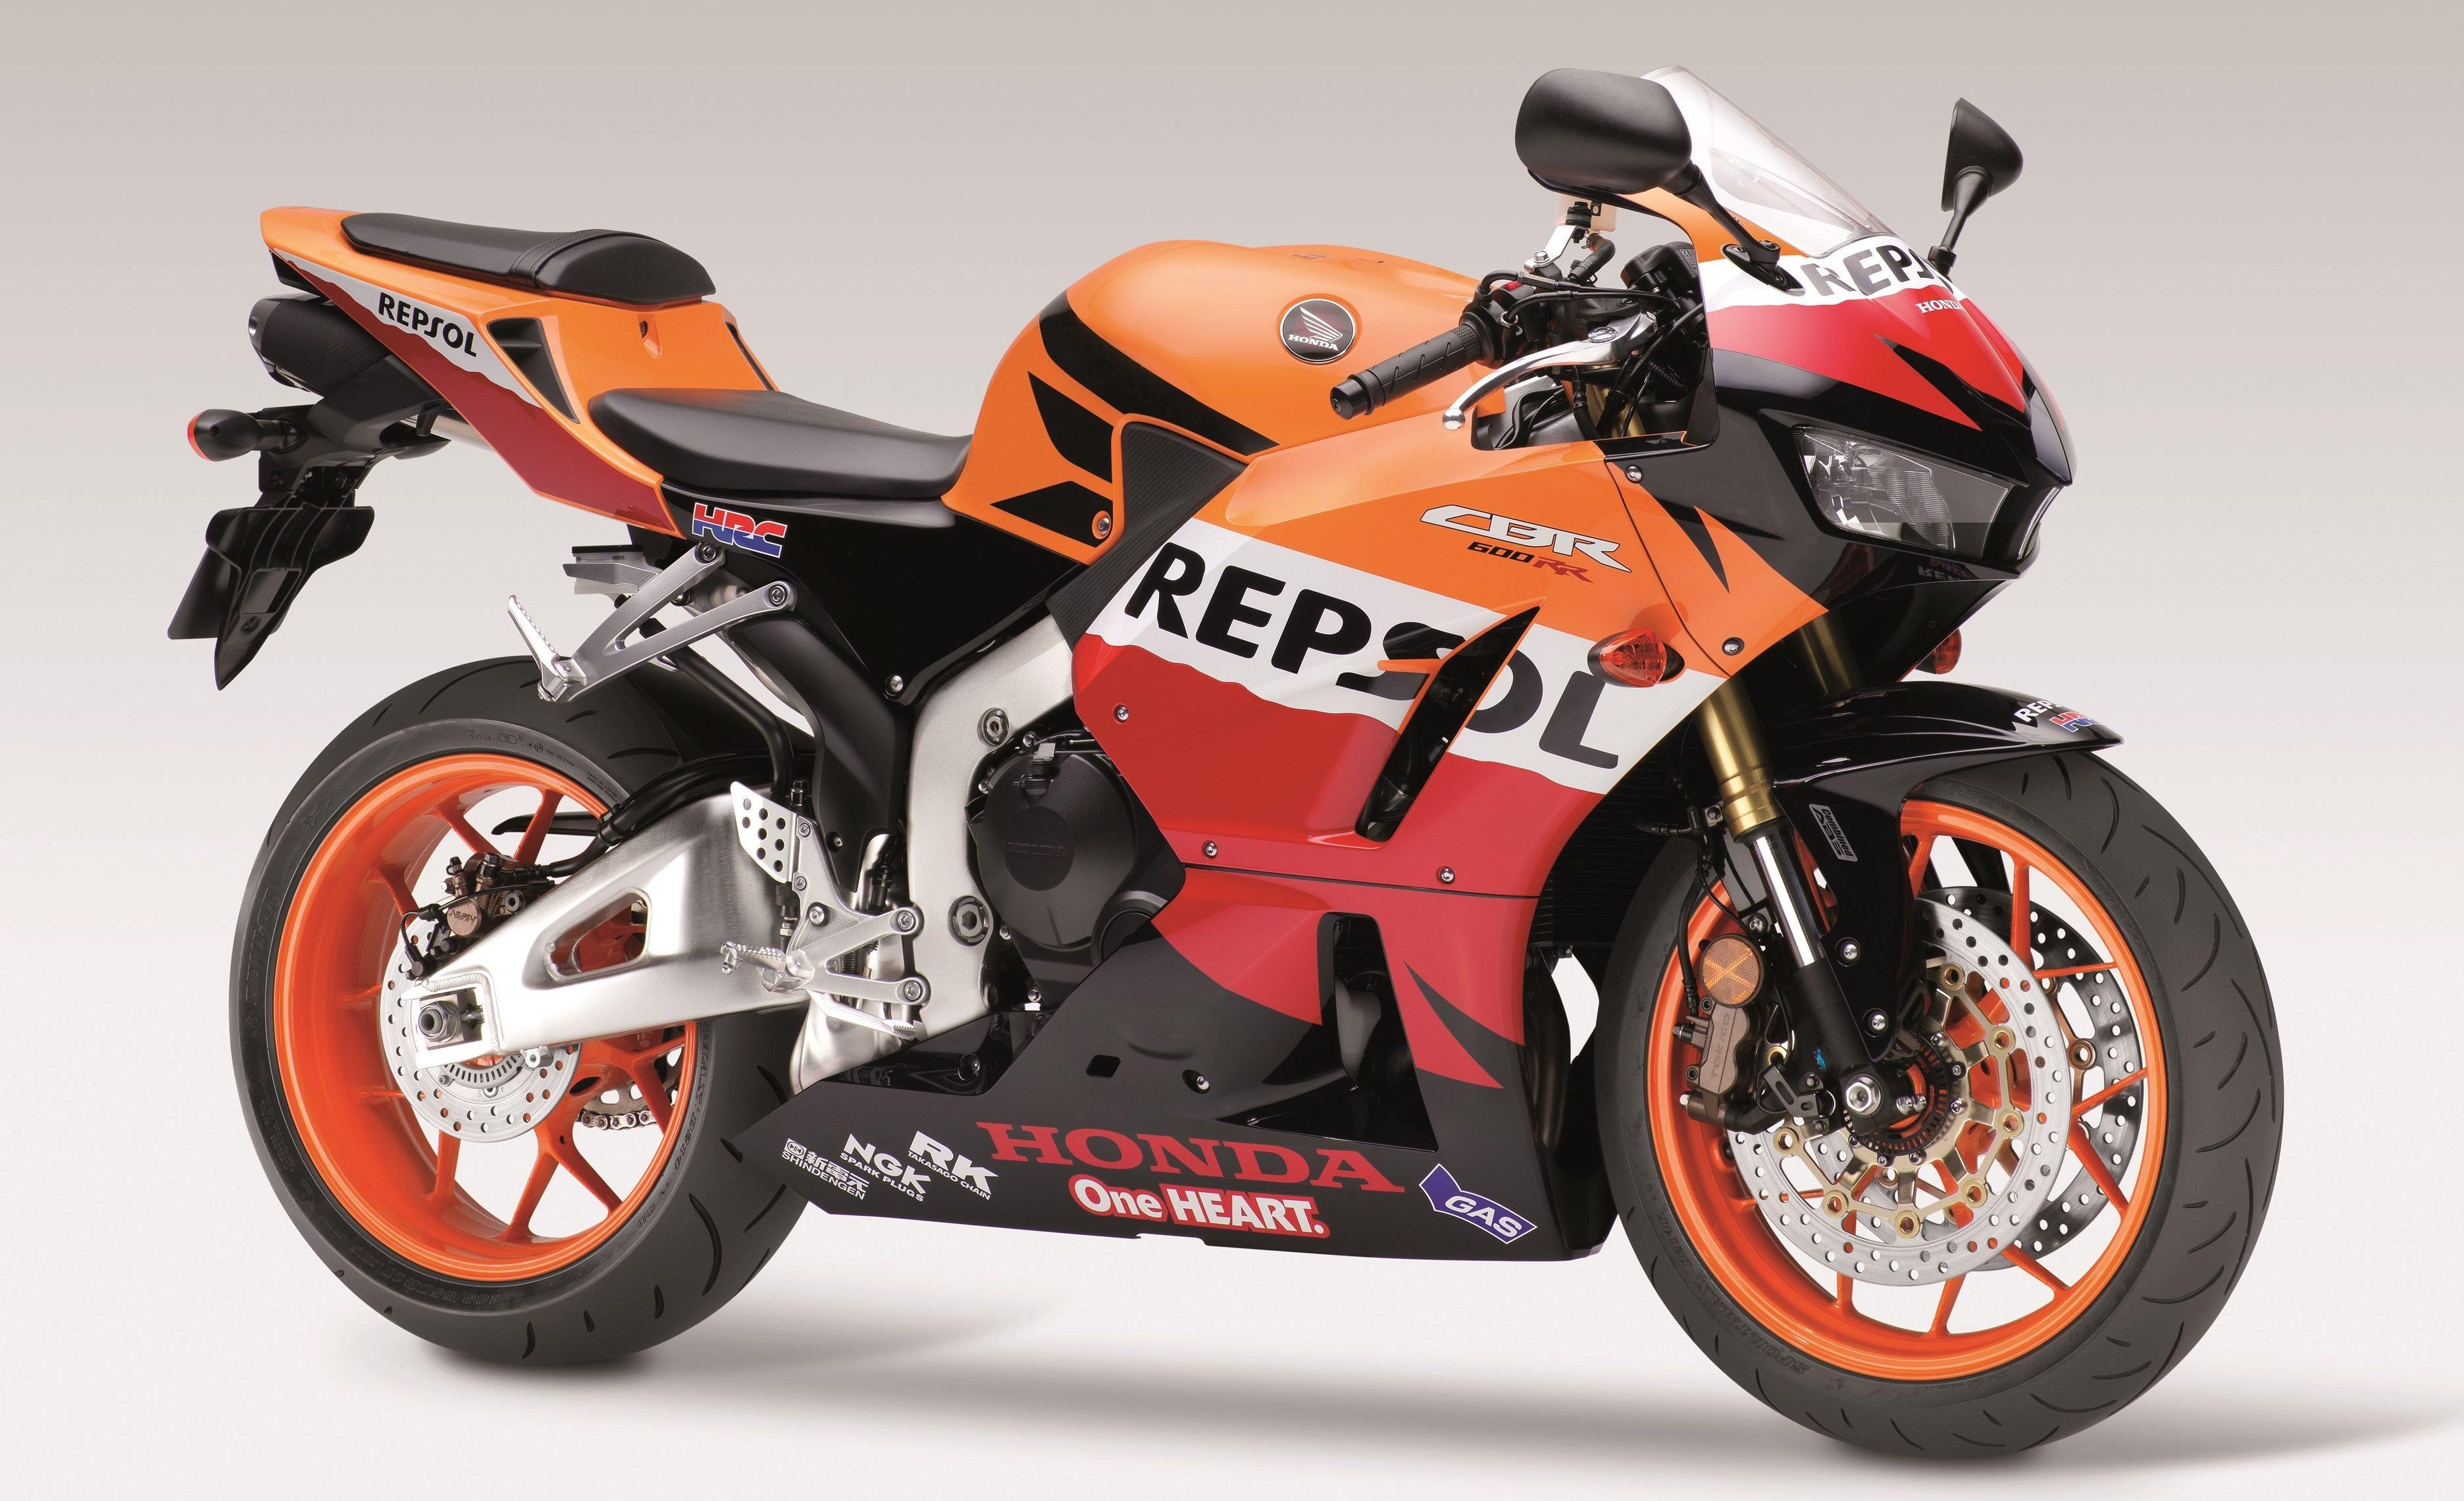 Honda axes CBR600RR sportsbike from 2017 range Paul Tan ...